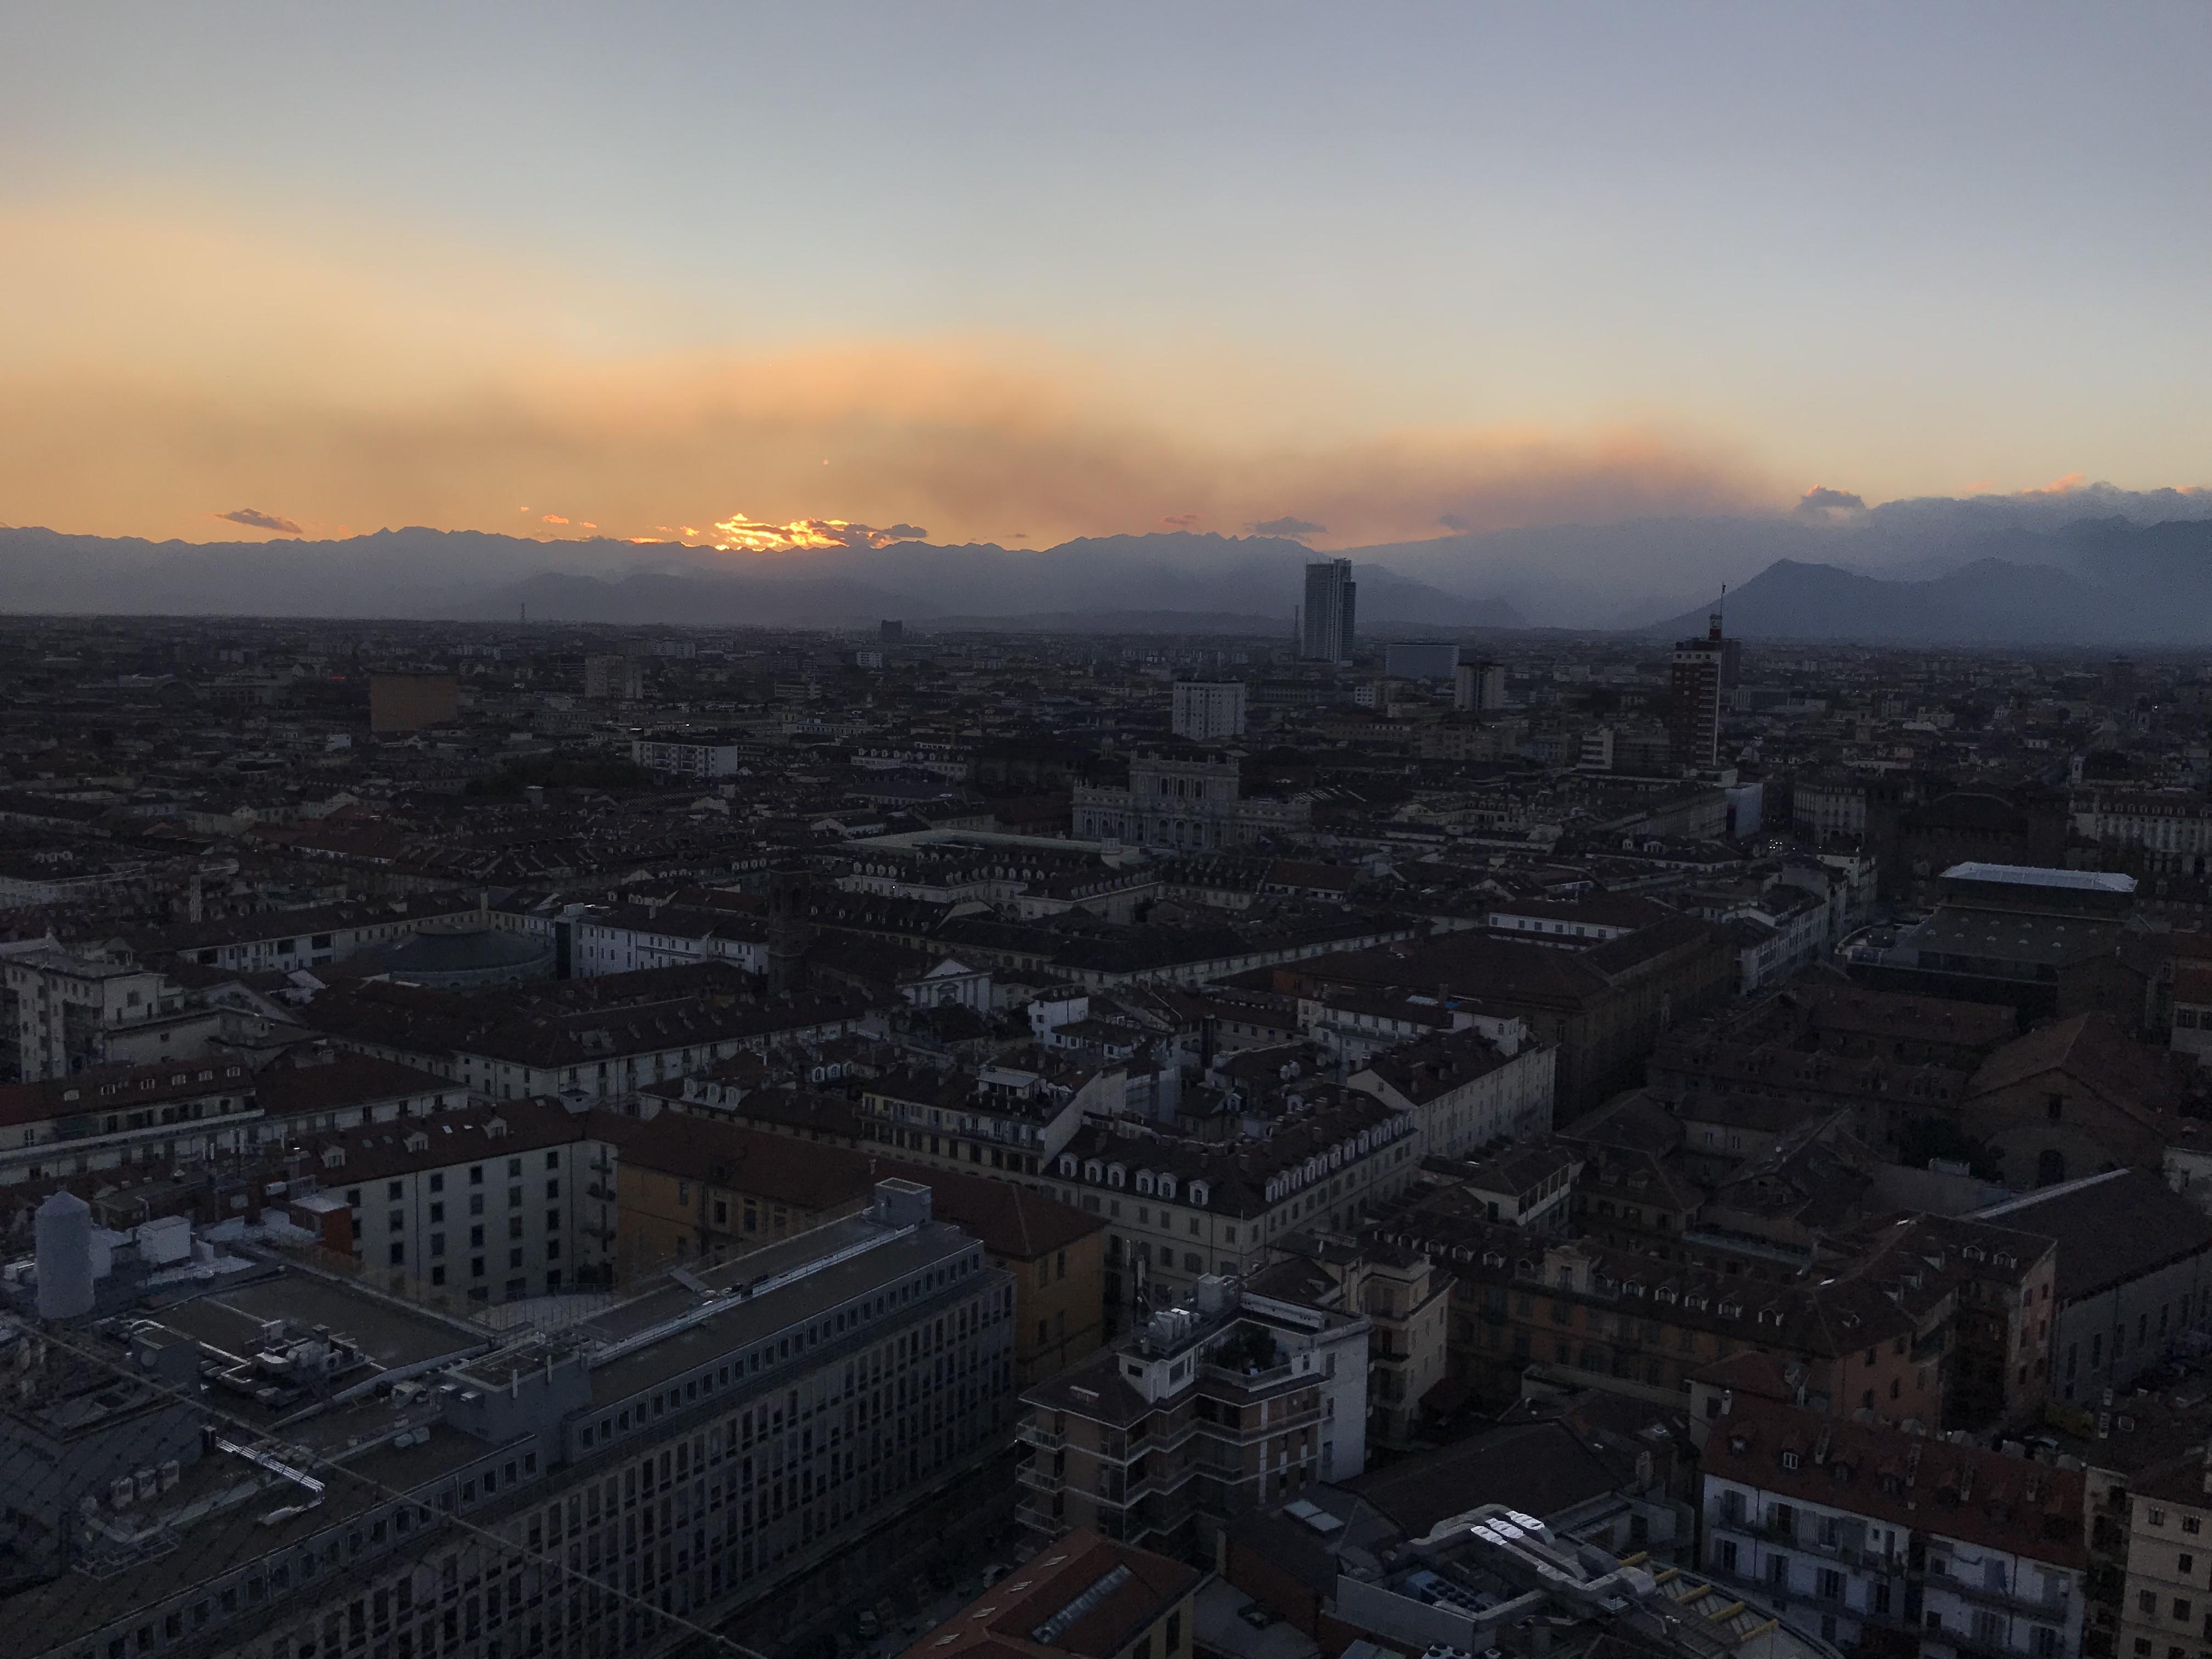 Fumo incendi su Torino